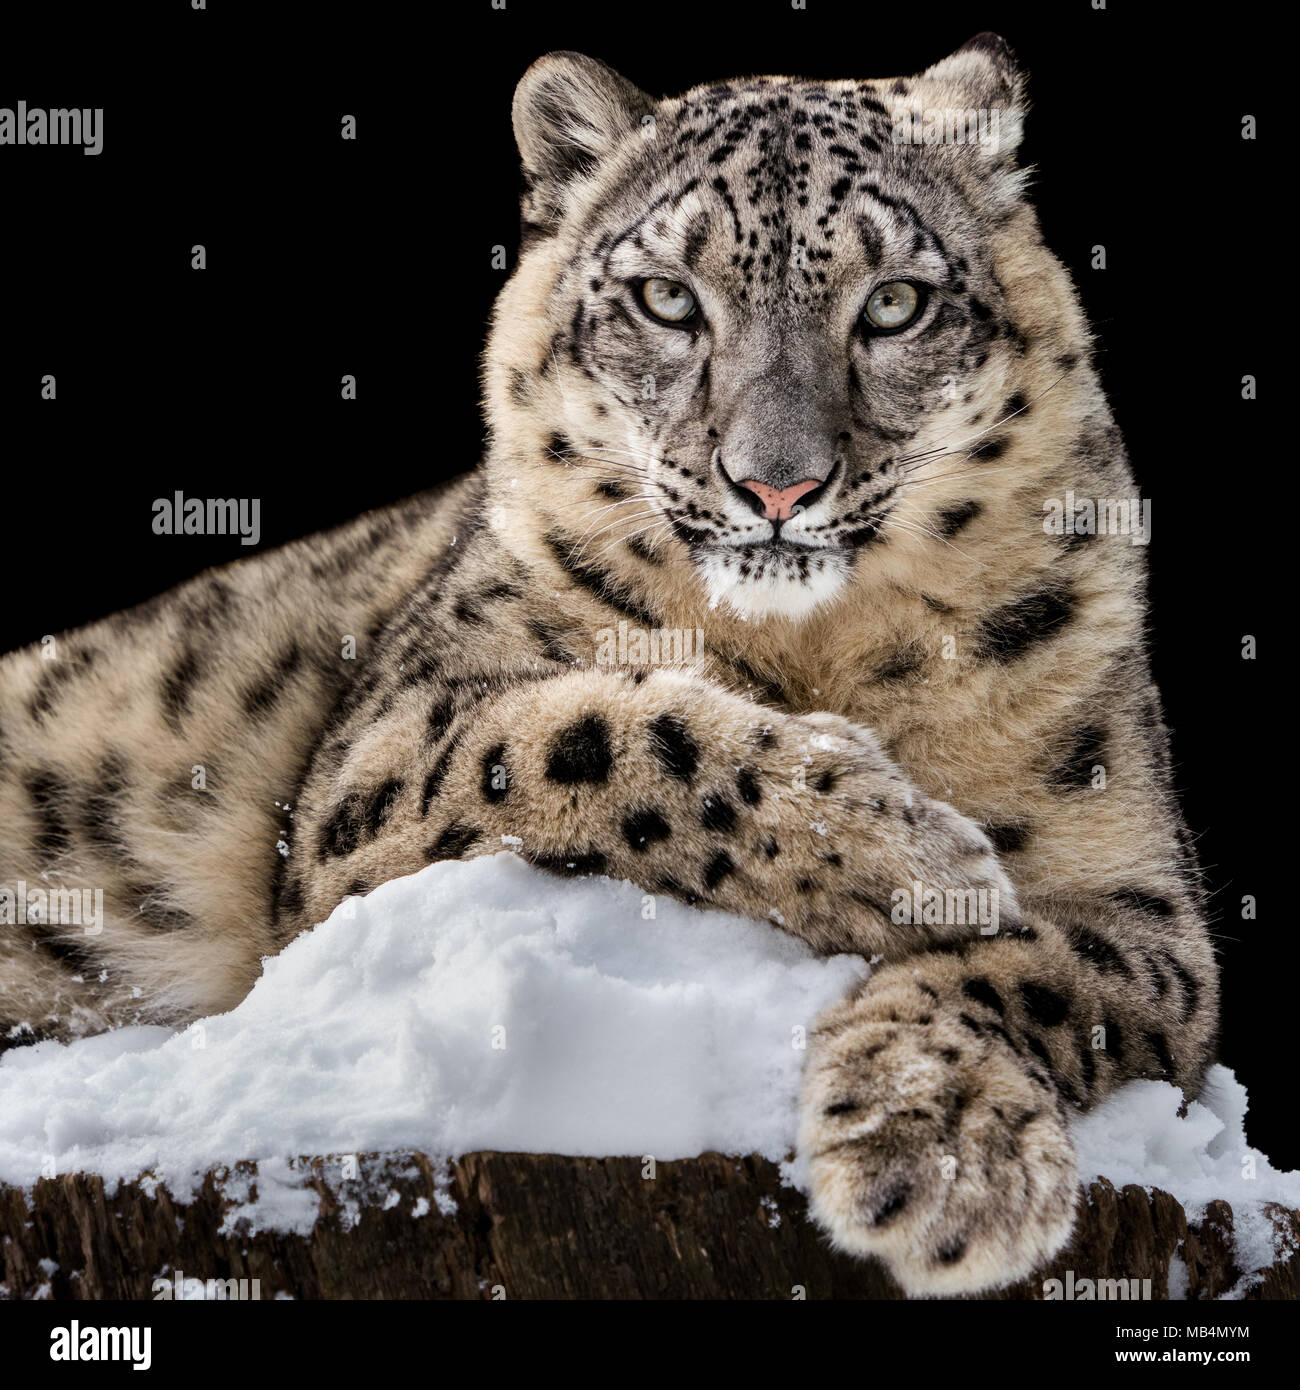 Frontal Portrait of Snow Leopard Against Black Background - Stock Image